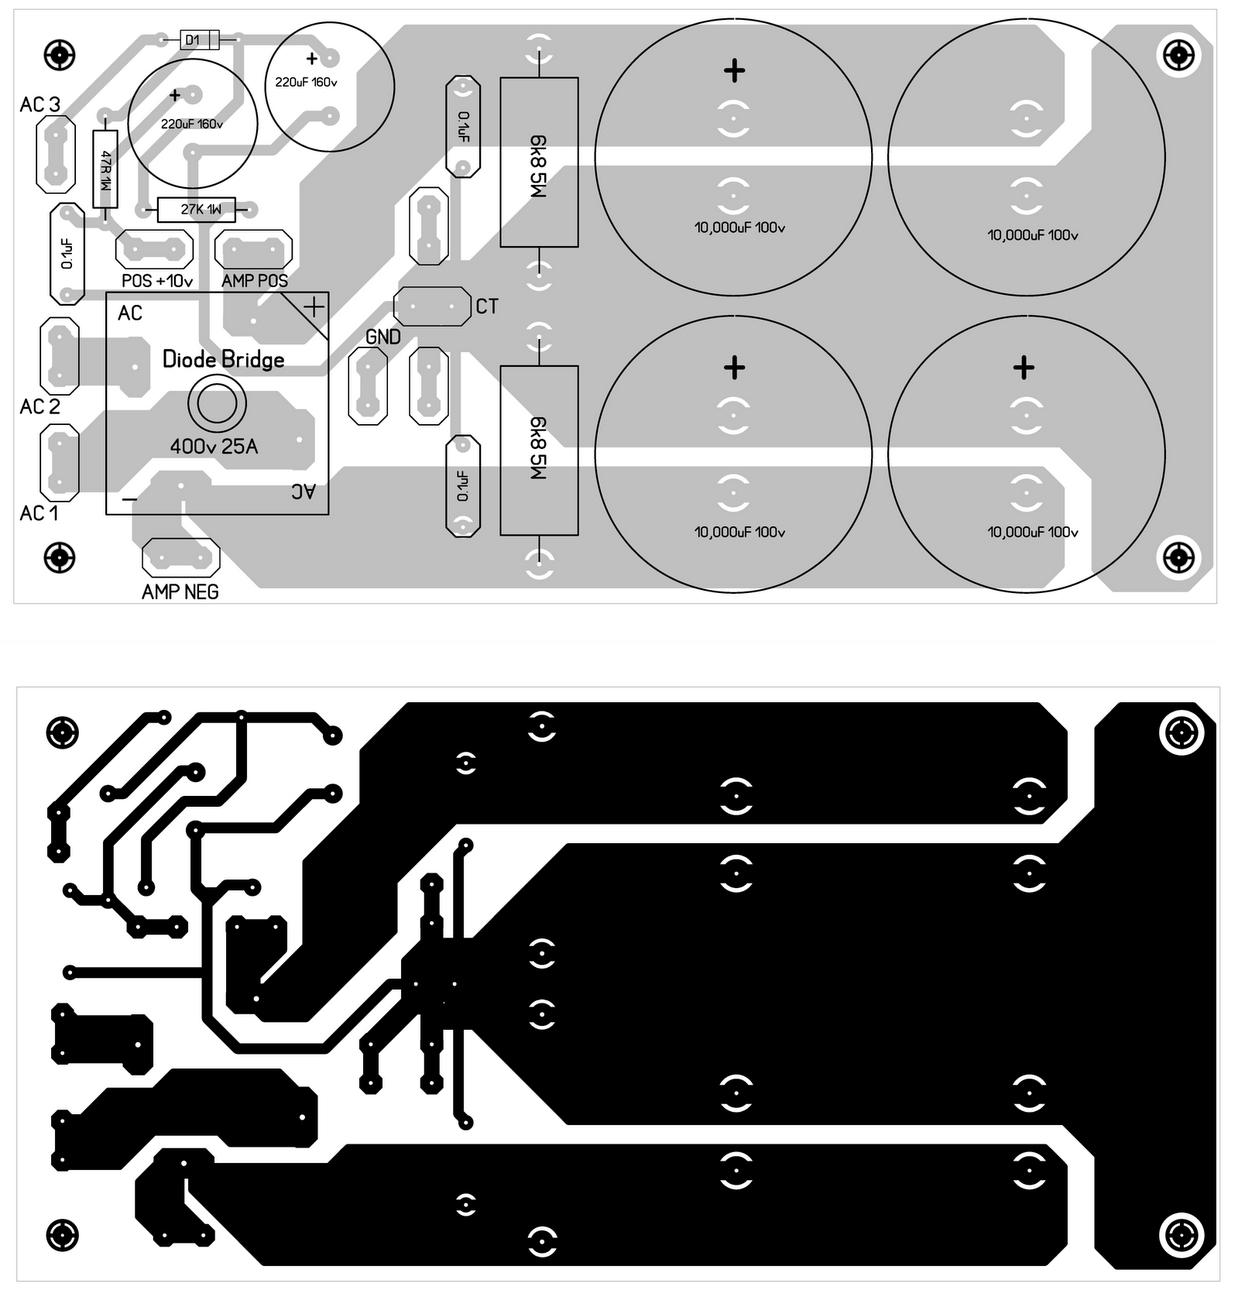 5000 Watts Power Amplifier Circuit Diagram 1998 Jeep Wrangler Tj Wiring 600 Watt Mosfet With Pcb Gallery